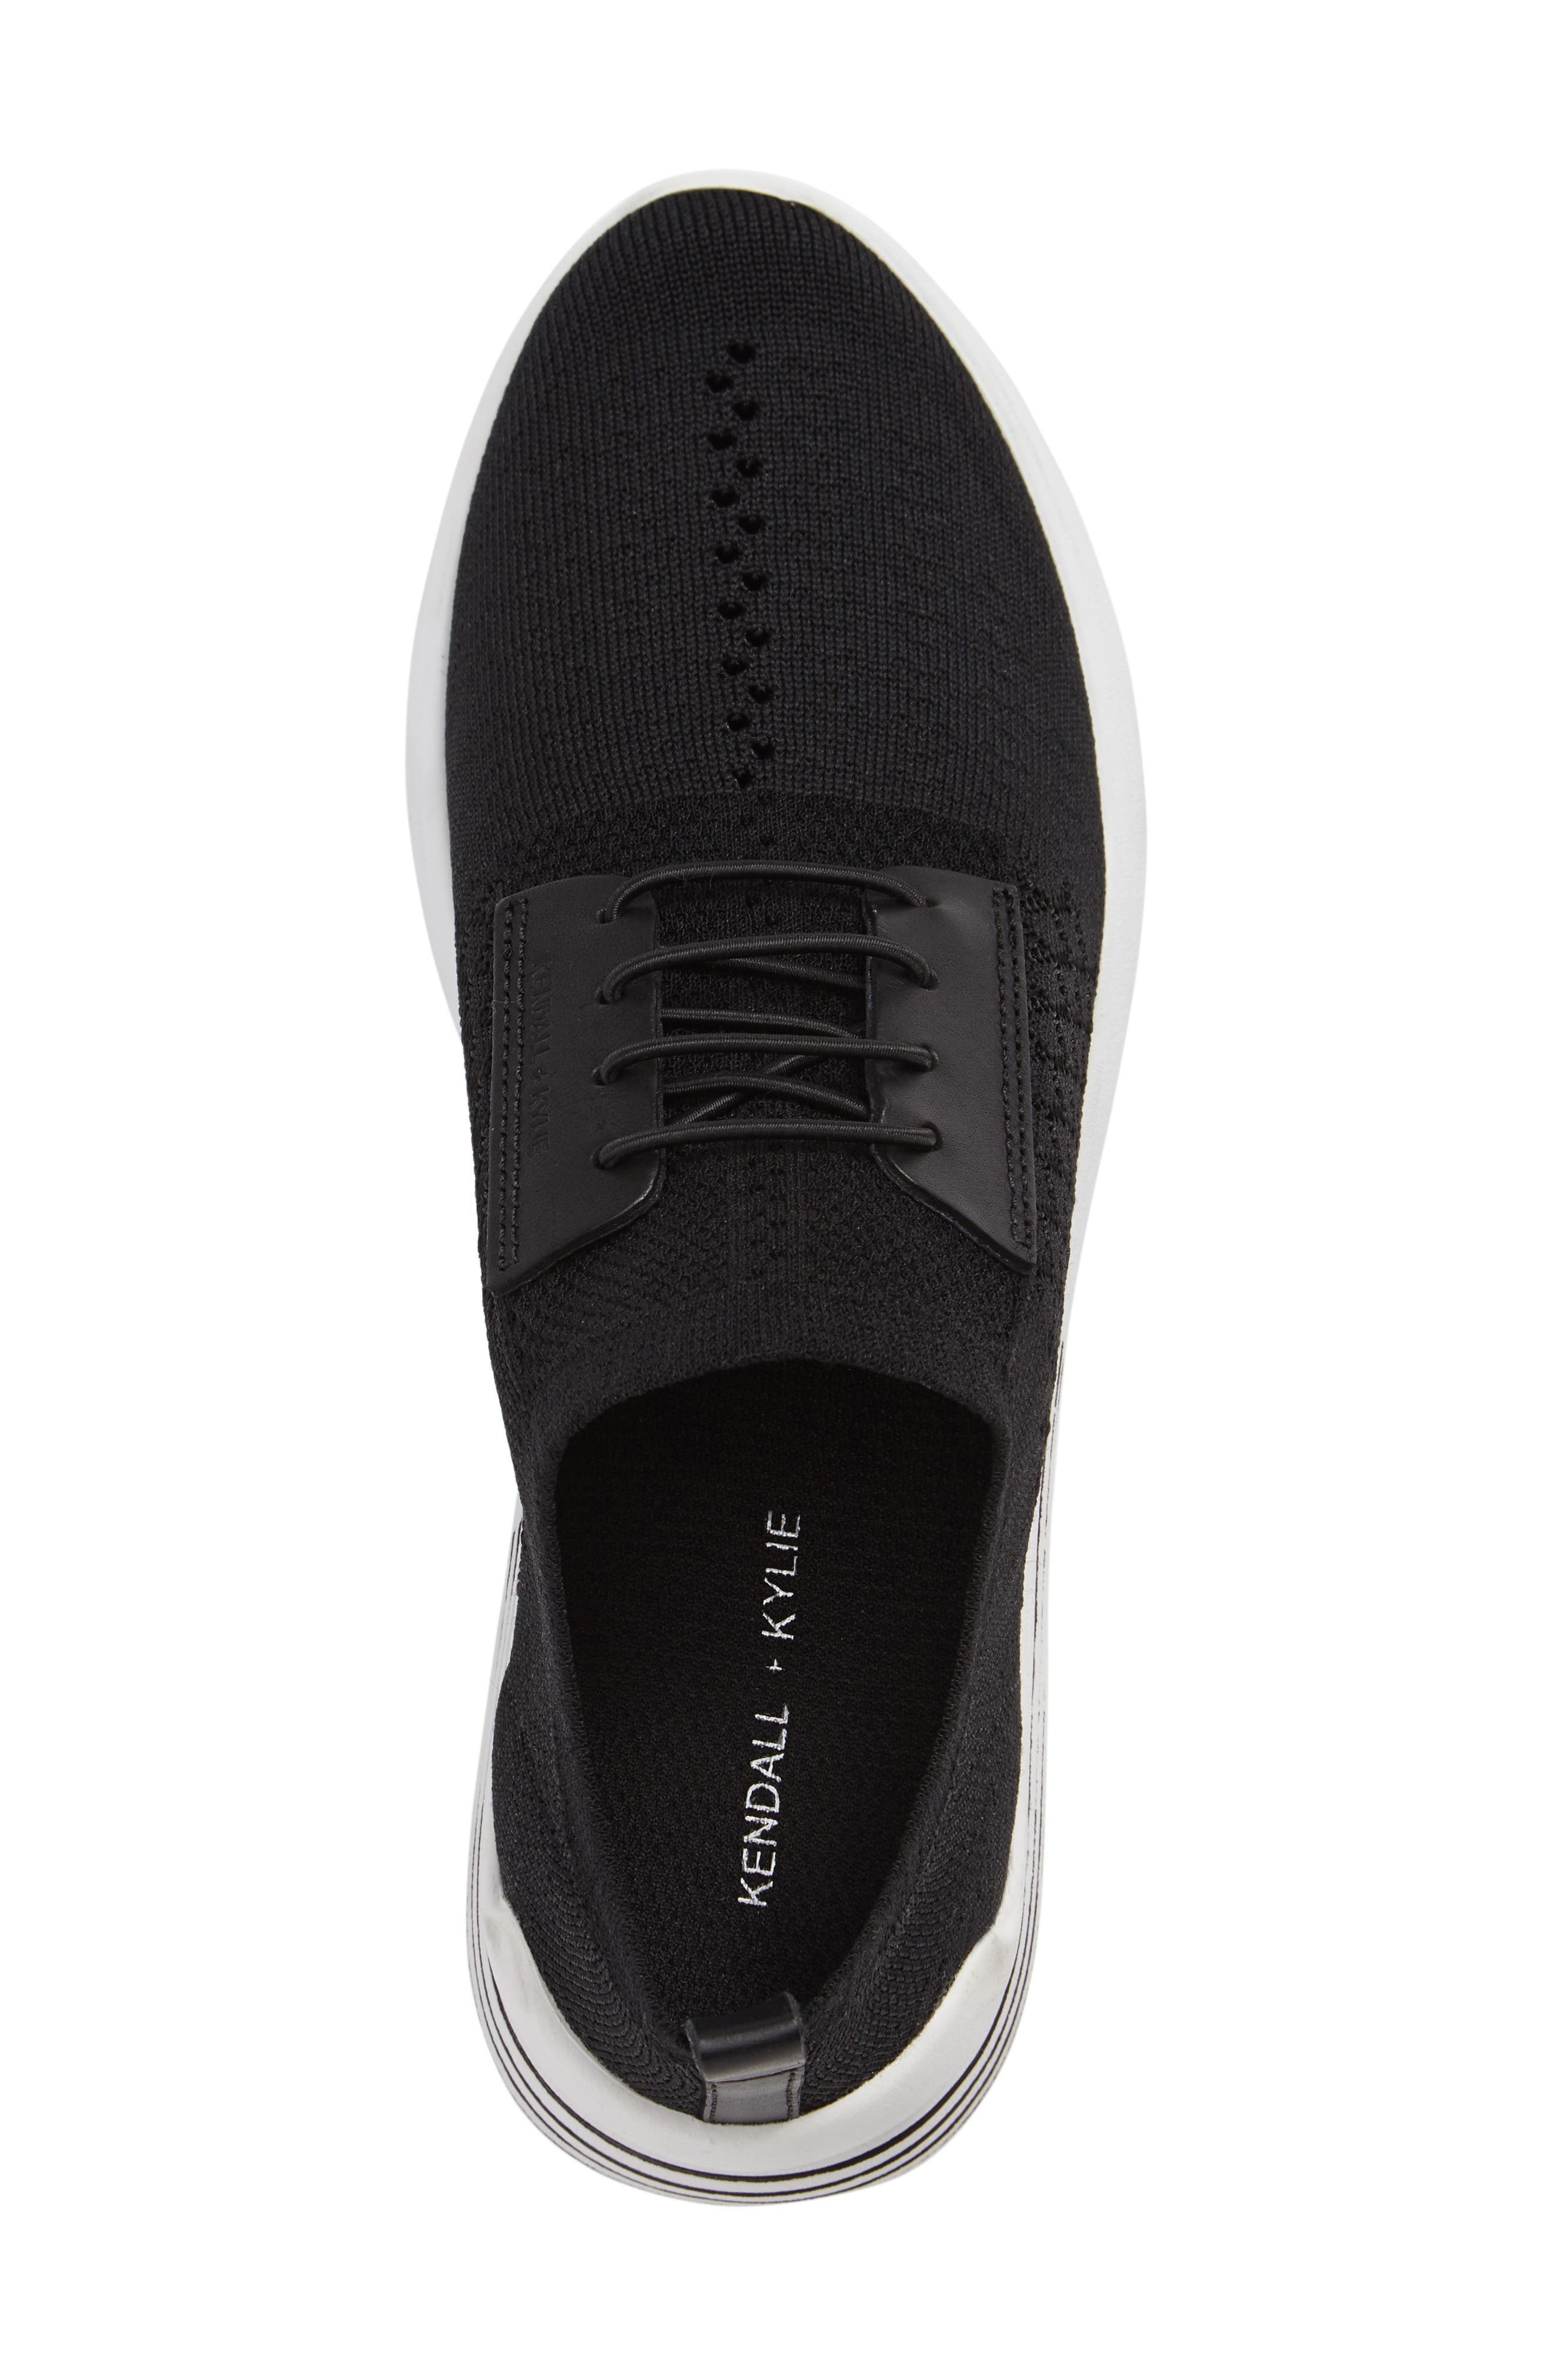 Brandy Woven Sneaker,                             Alternate thumbnail 3, color,                             Black/ Black Fabric